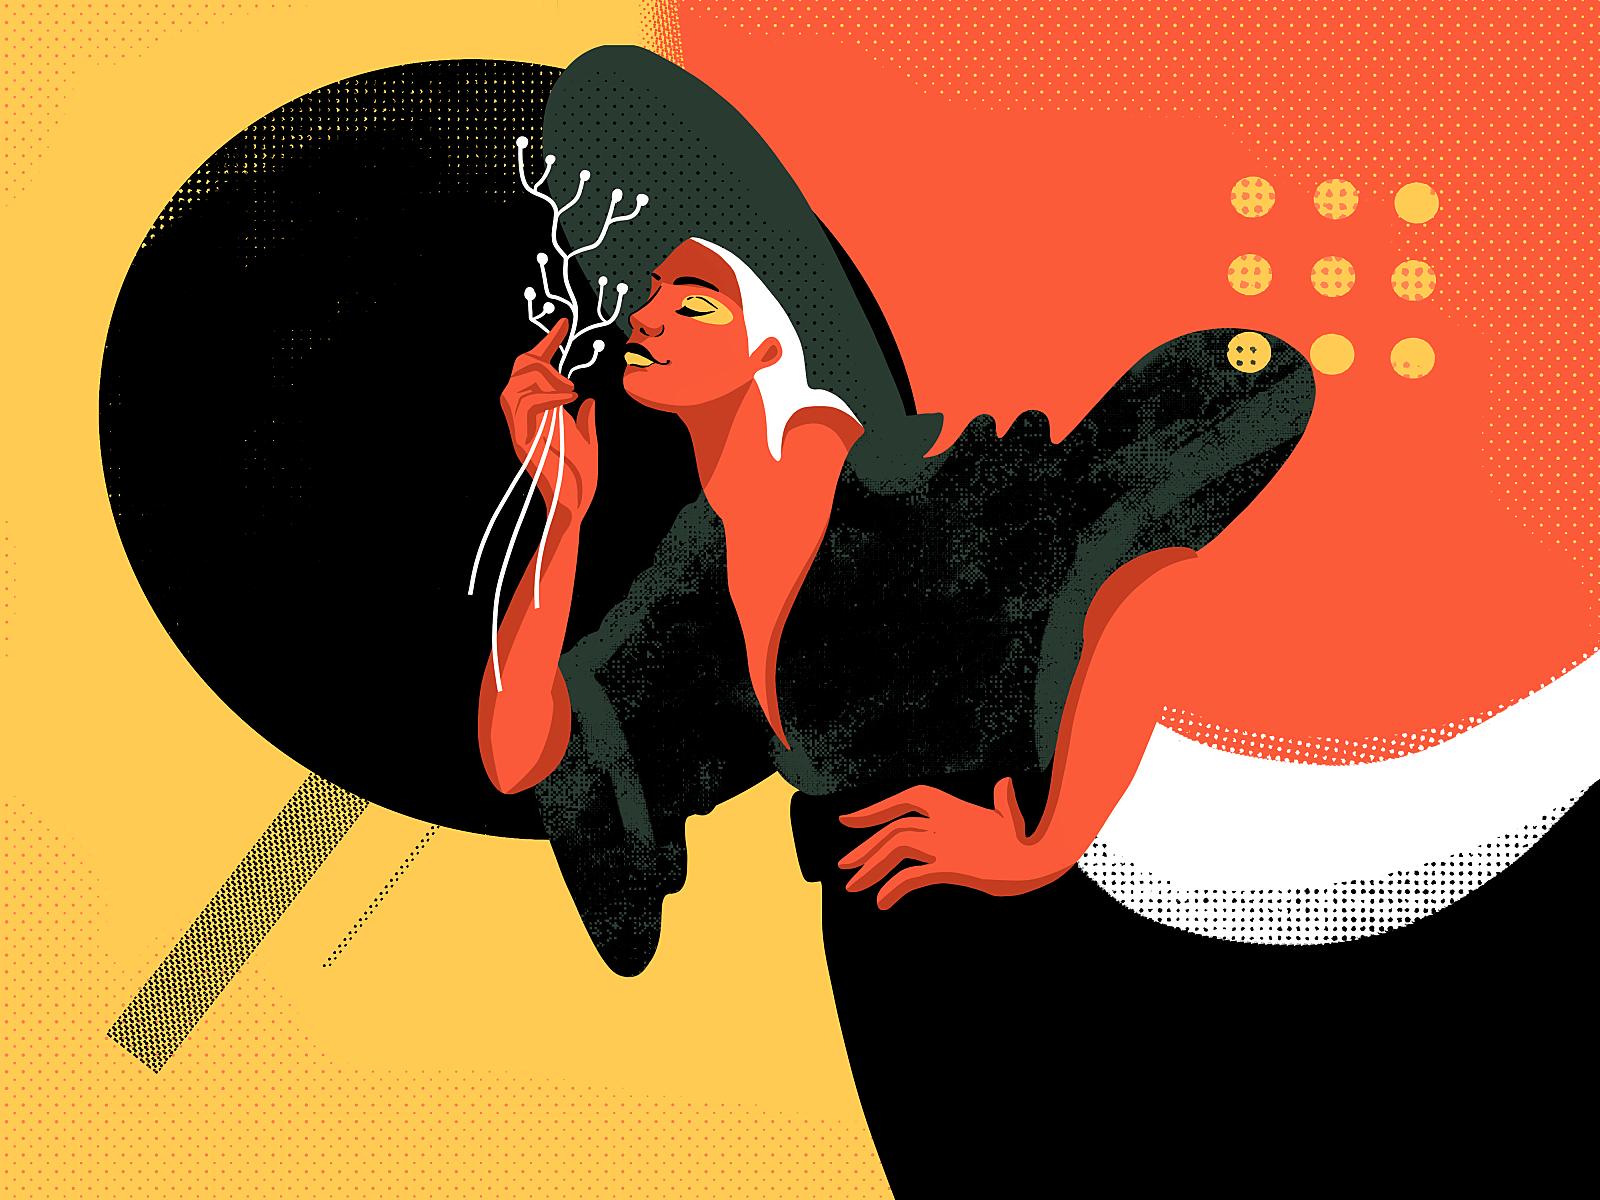 negative space illustration